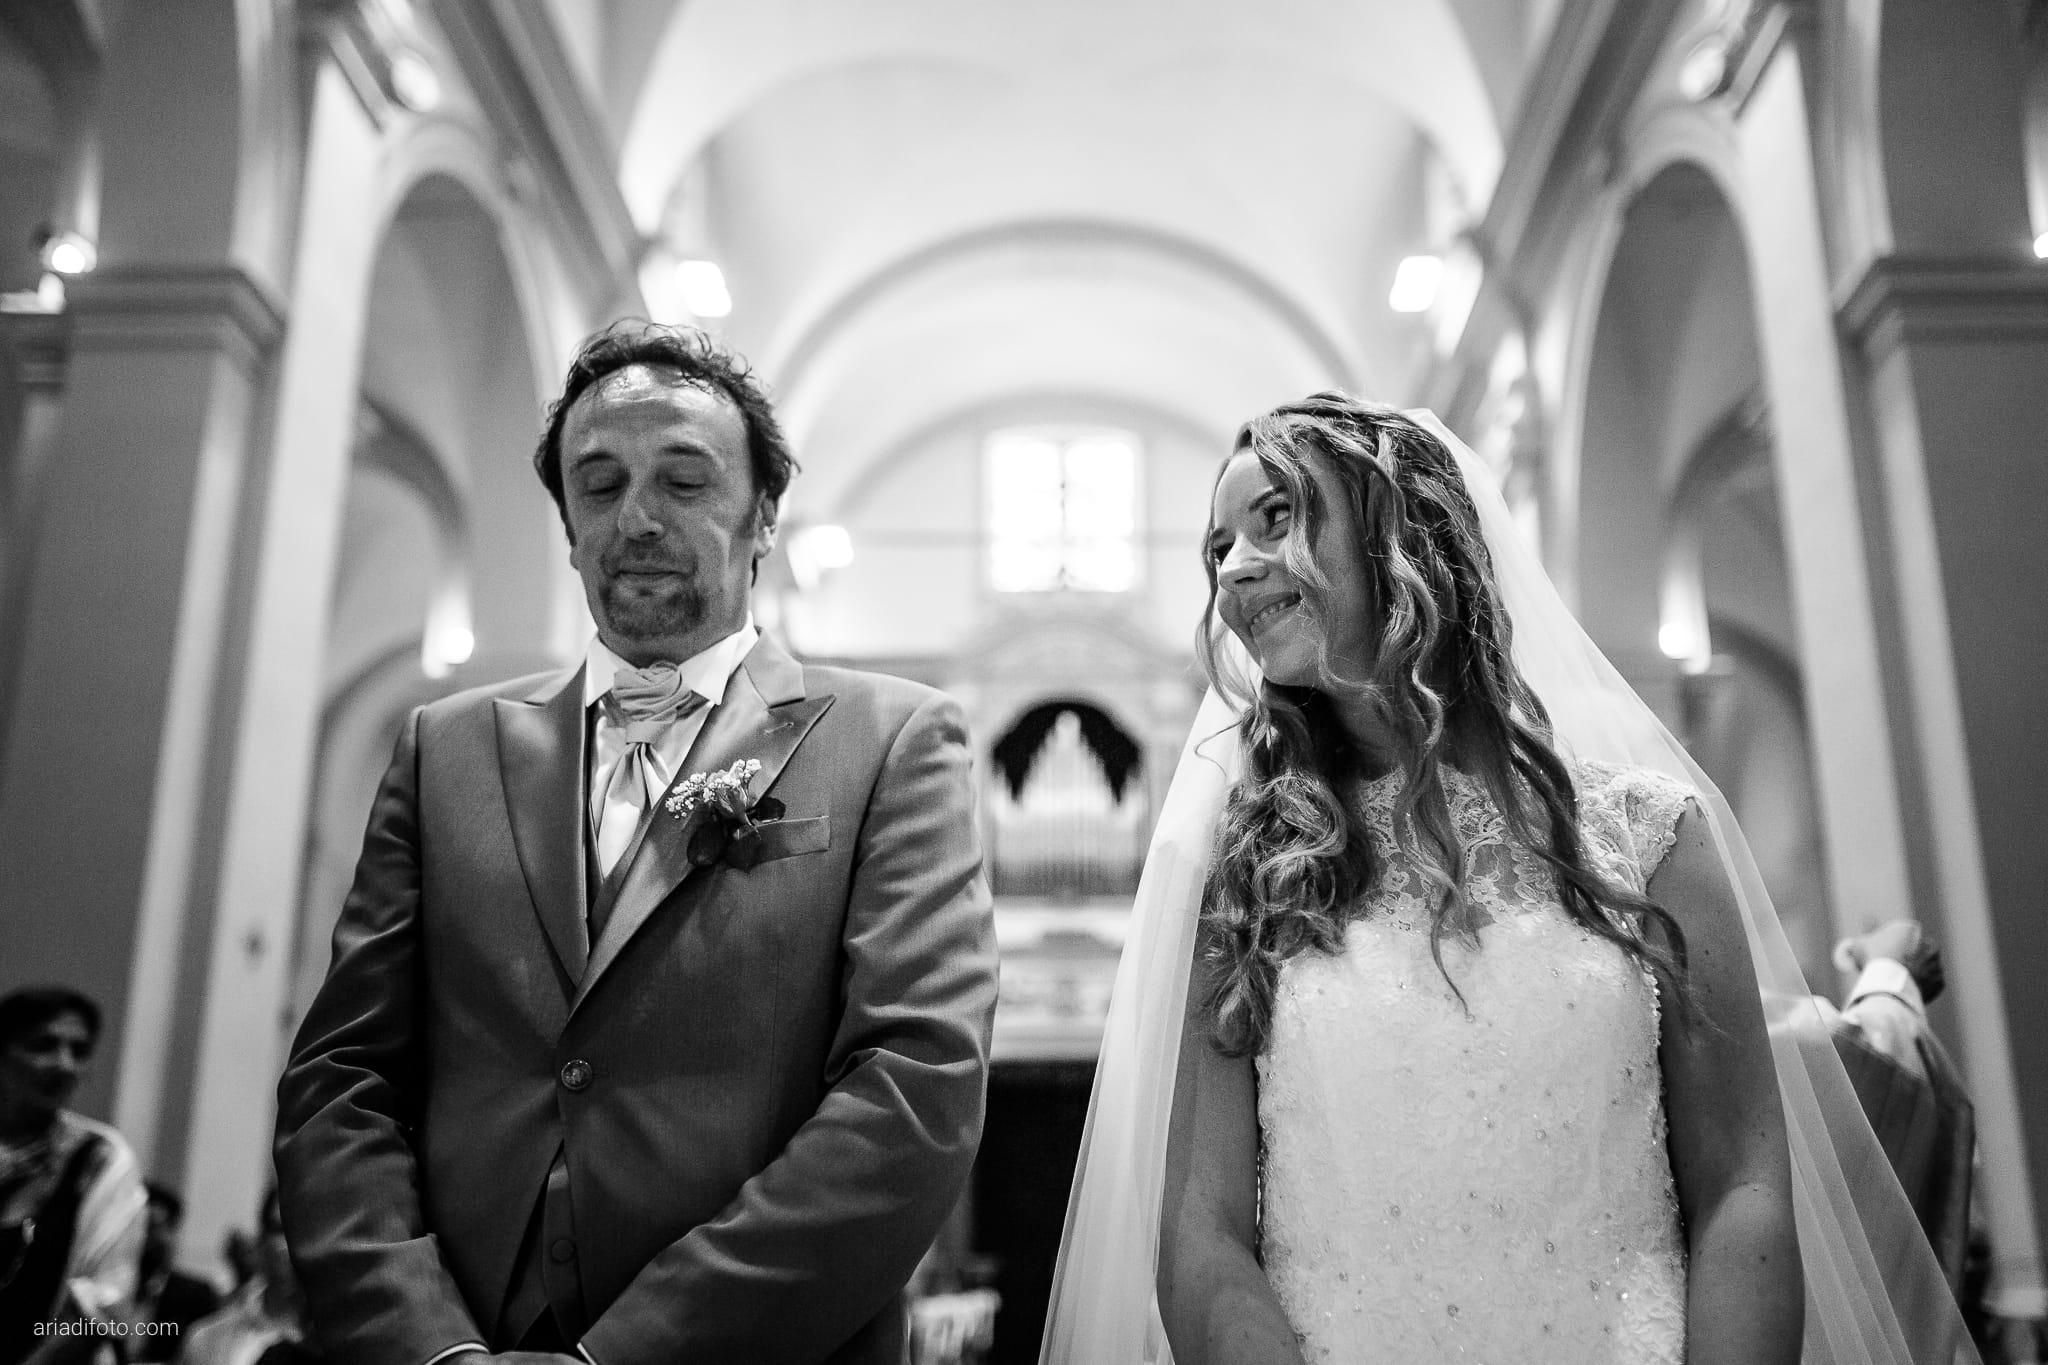 Valentina Francesco Matrimonio Chiesa San Giorgio Martire Pagnacco Castello Villalta Fagagna Udine cerimonia